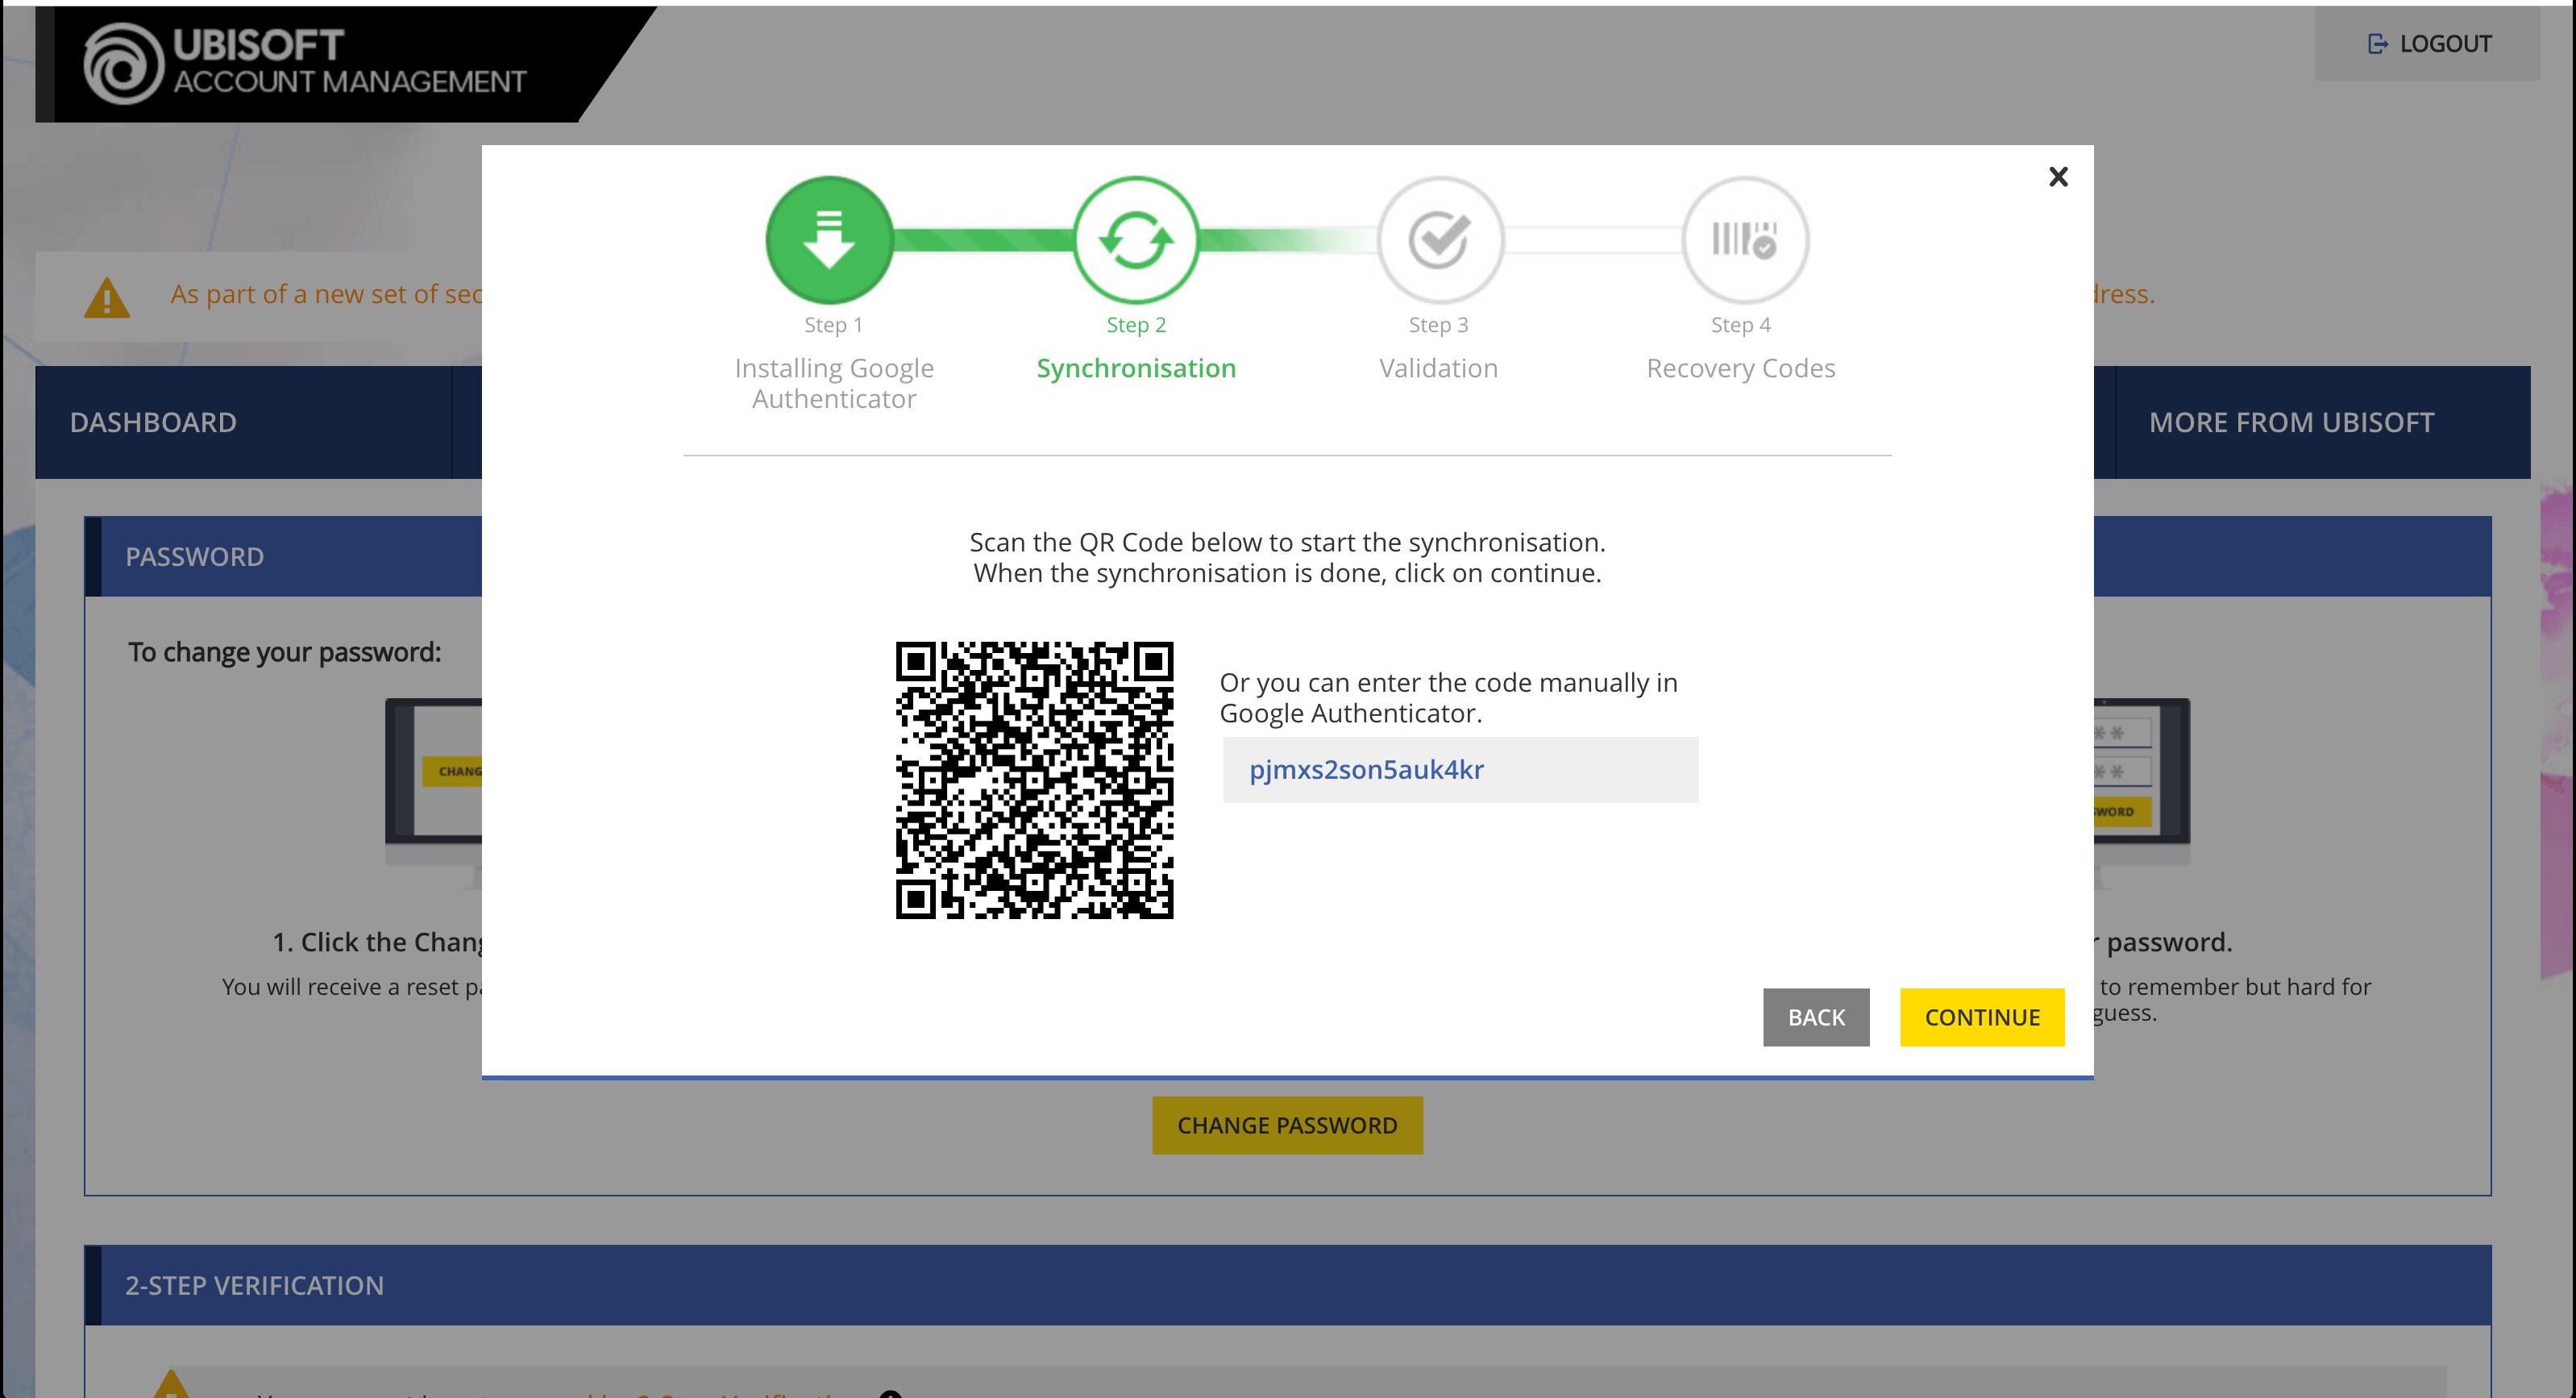 ubisoft account password reset email